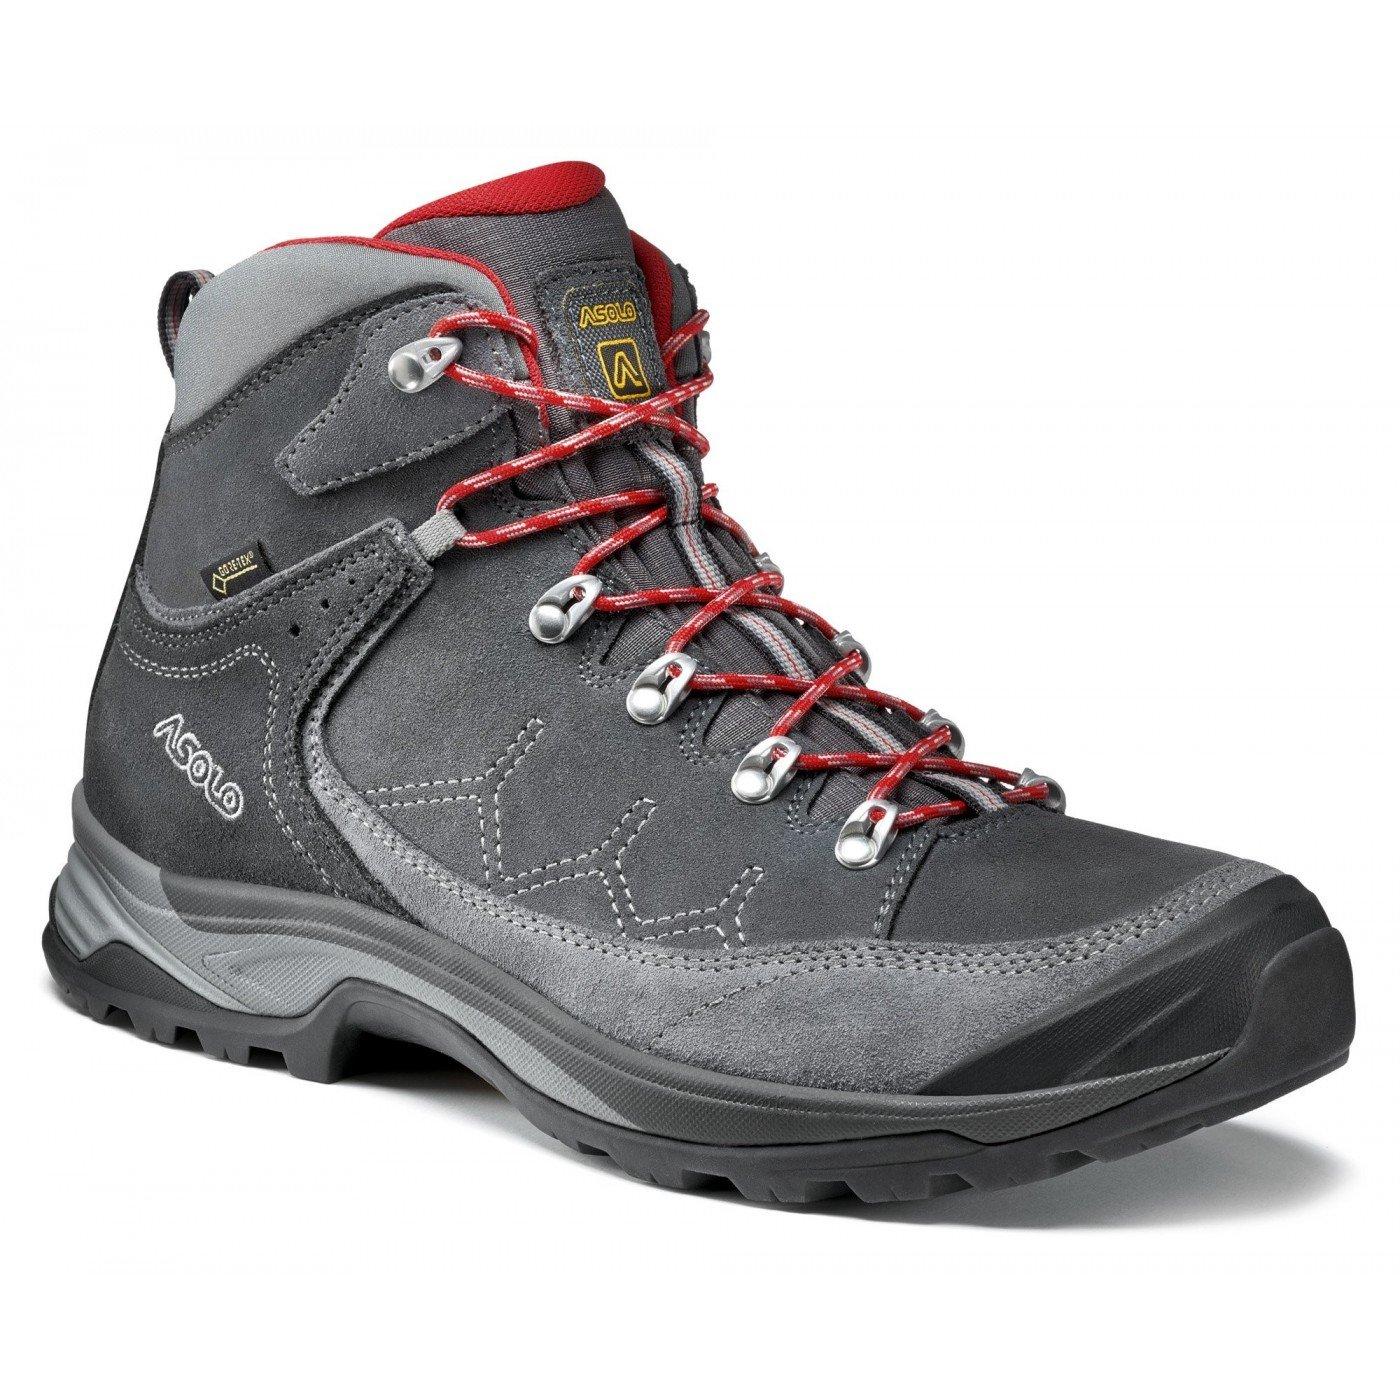 asolo-falcon-lth-gv-mm-chaussure-randonnee-homme-1